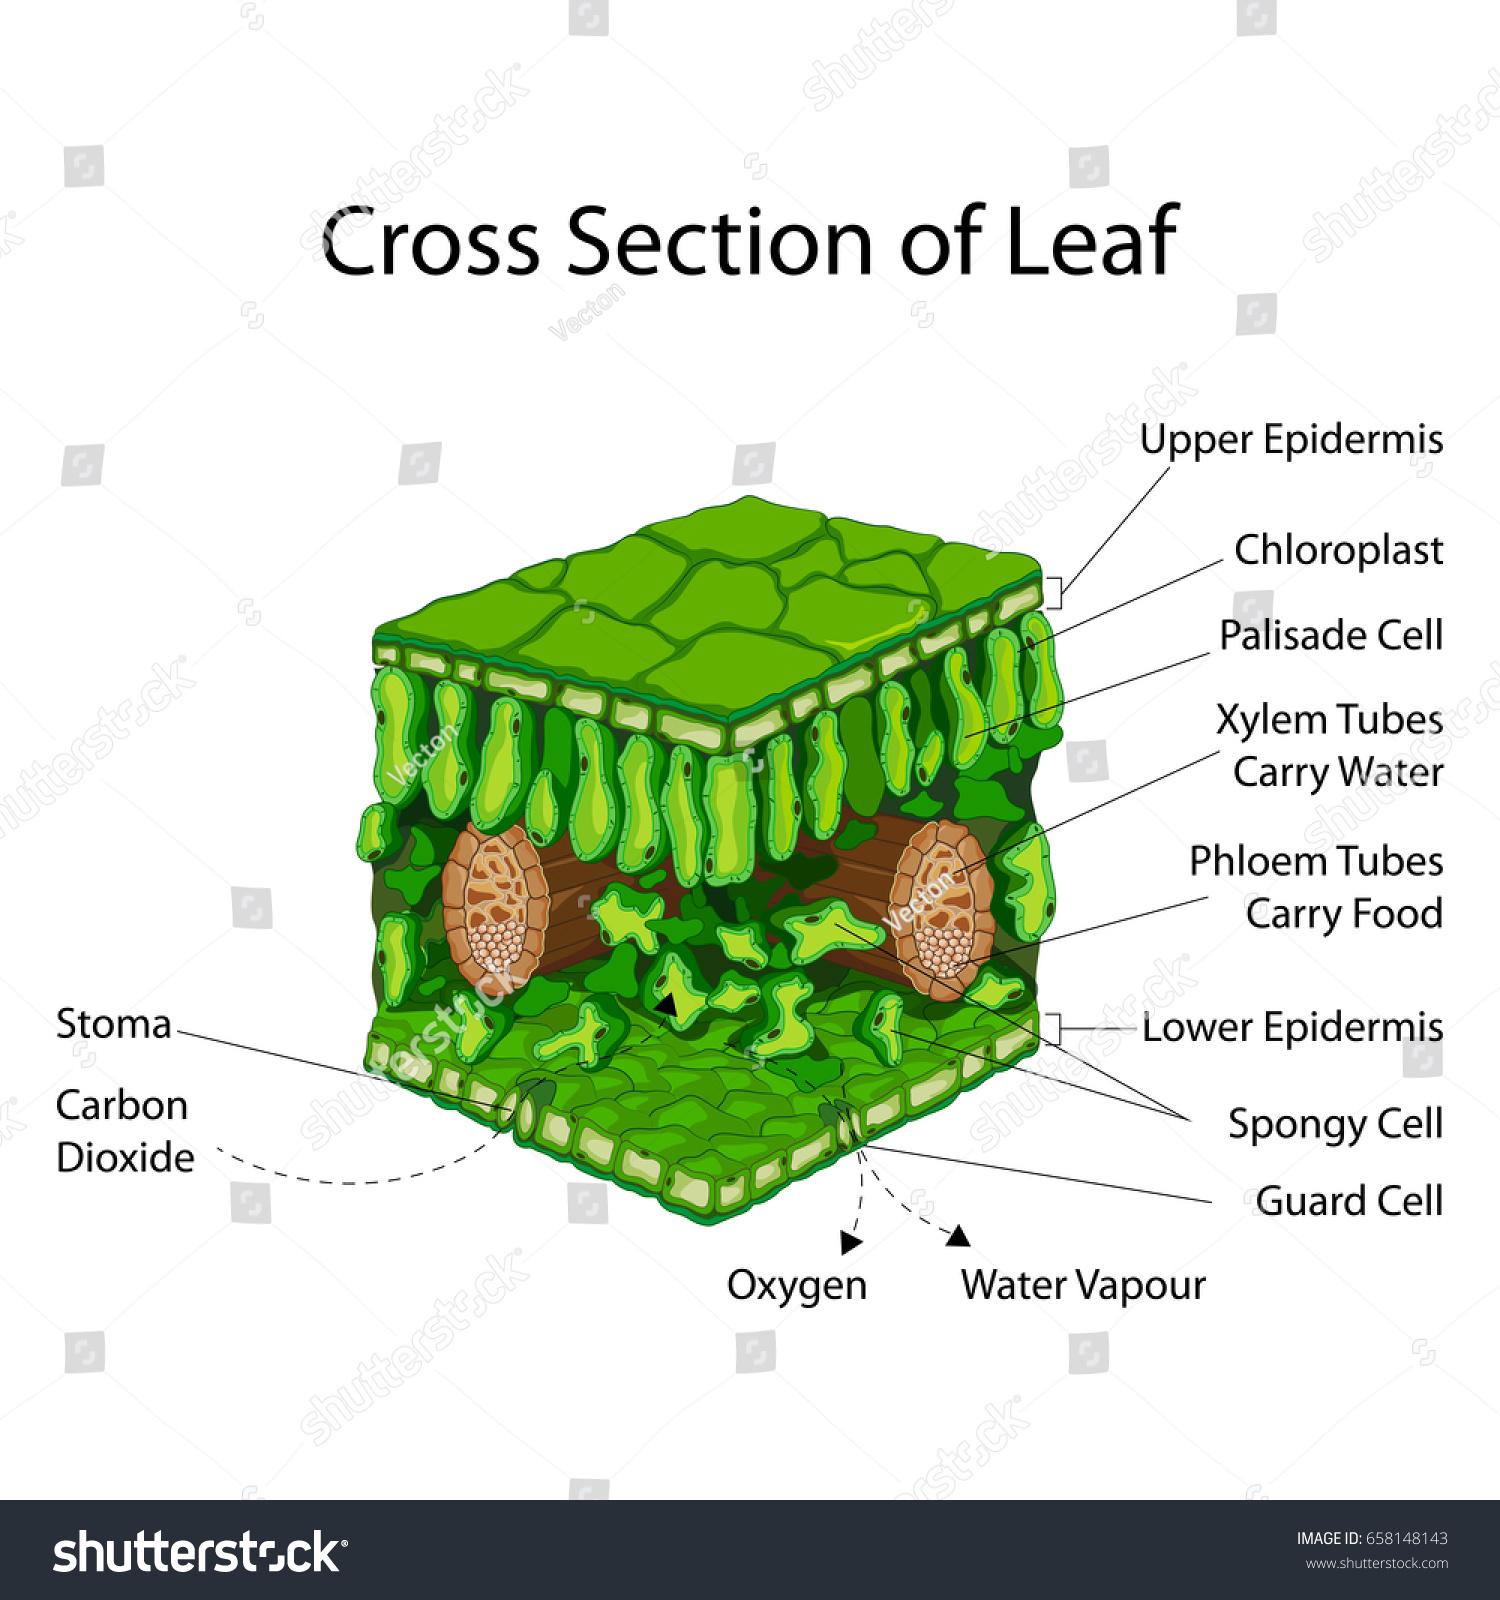 Education chart biology cross section leaf stock vector 658148143 education chart of biology for cross section of leaf diagram vector illustration pooptronica